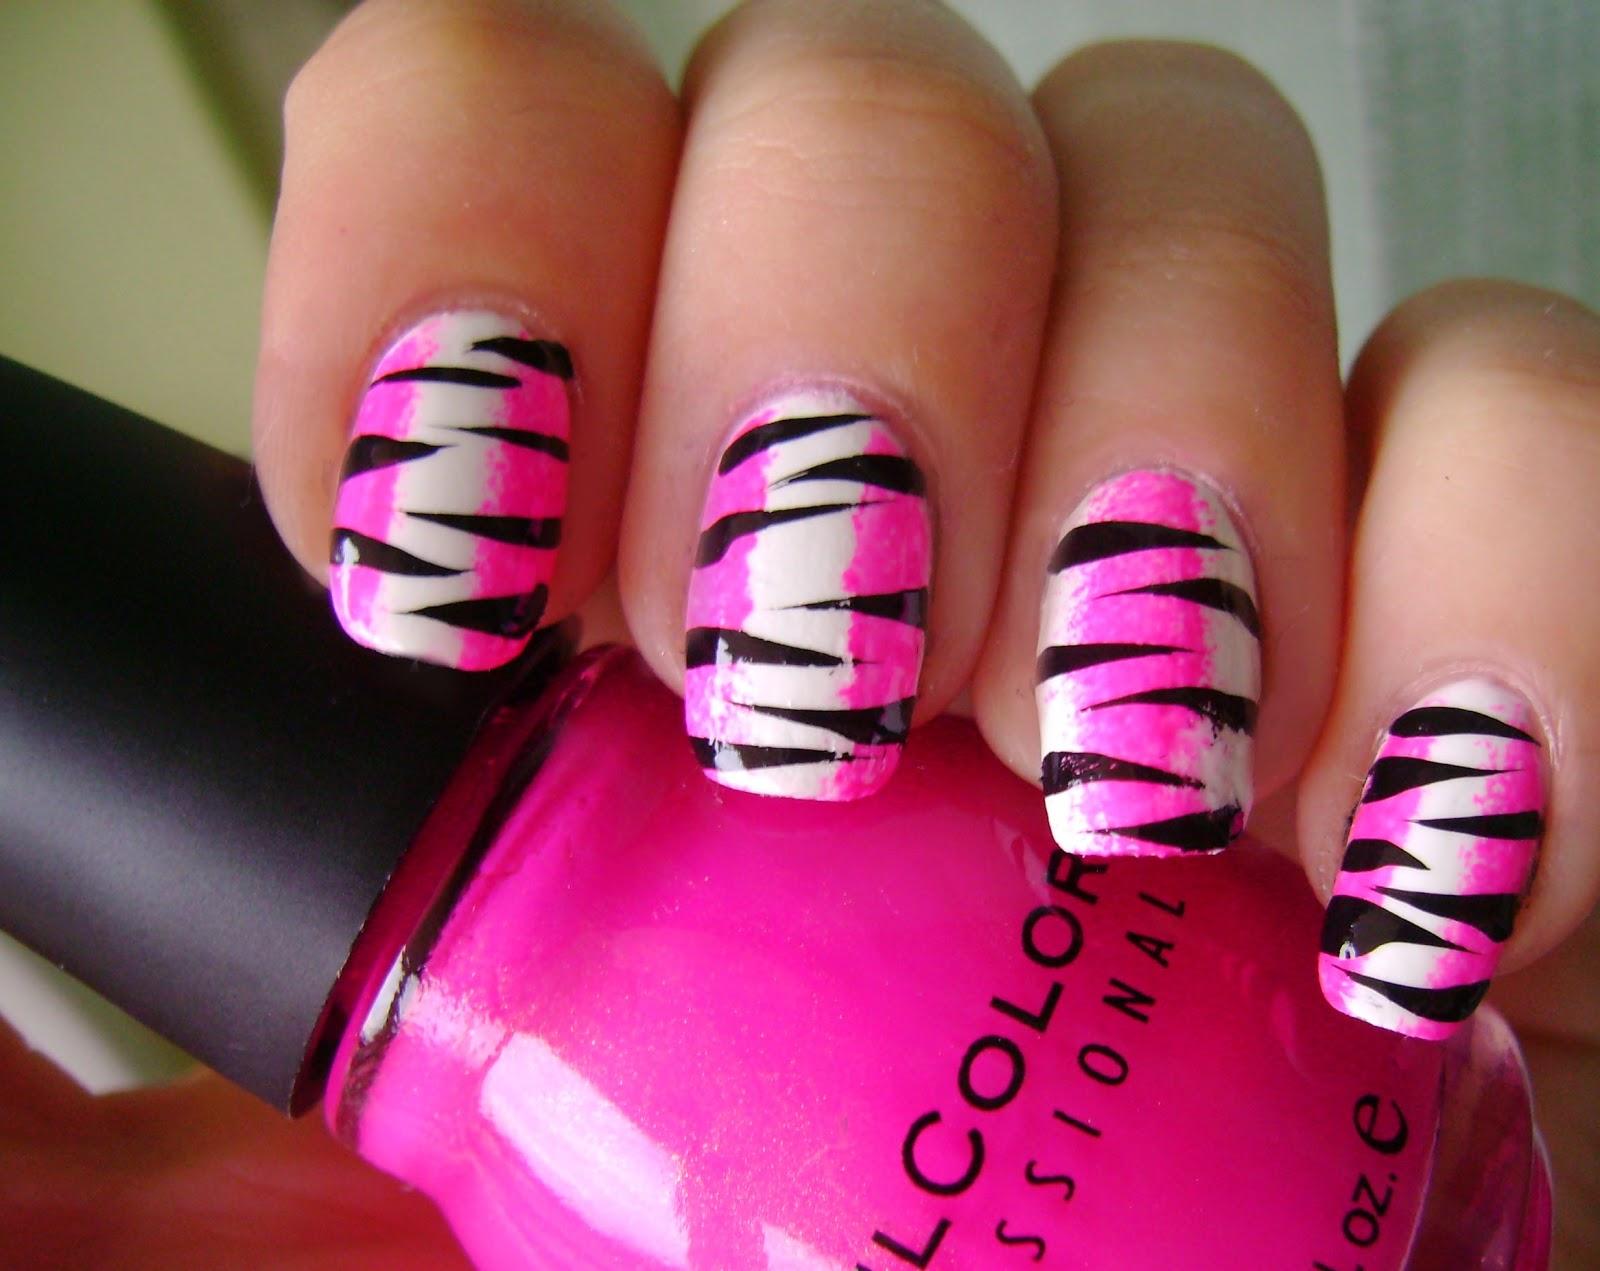 acrylic nail art designs: Go Pink Wednesday -Pink zebra nails